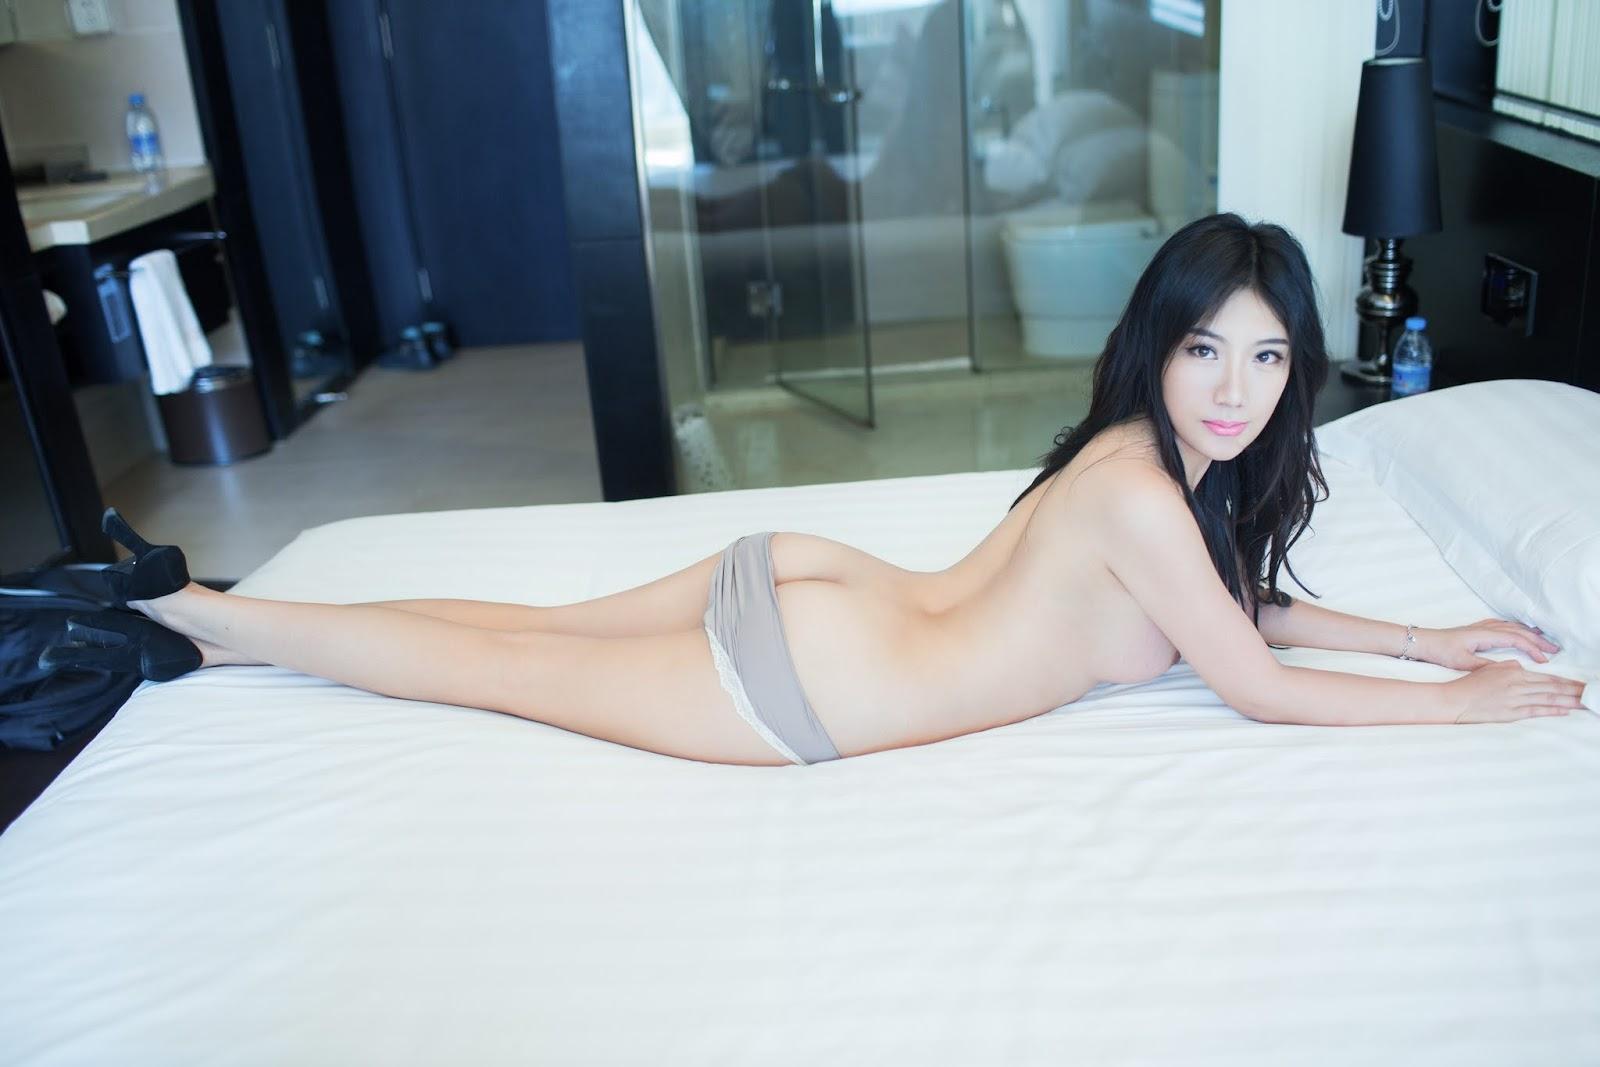 %25C2%25AC%252BO 06 - Hot Sexy Model TUIGIRL NO.46 Nude